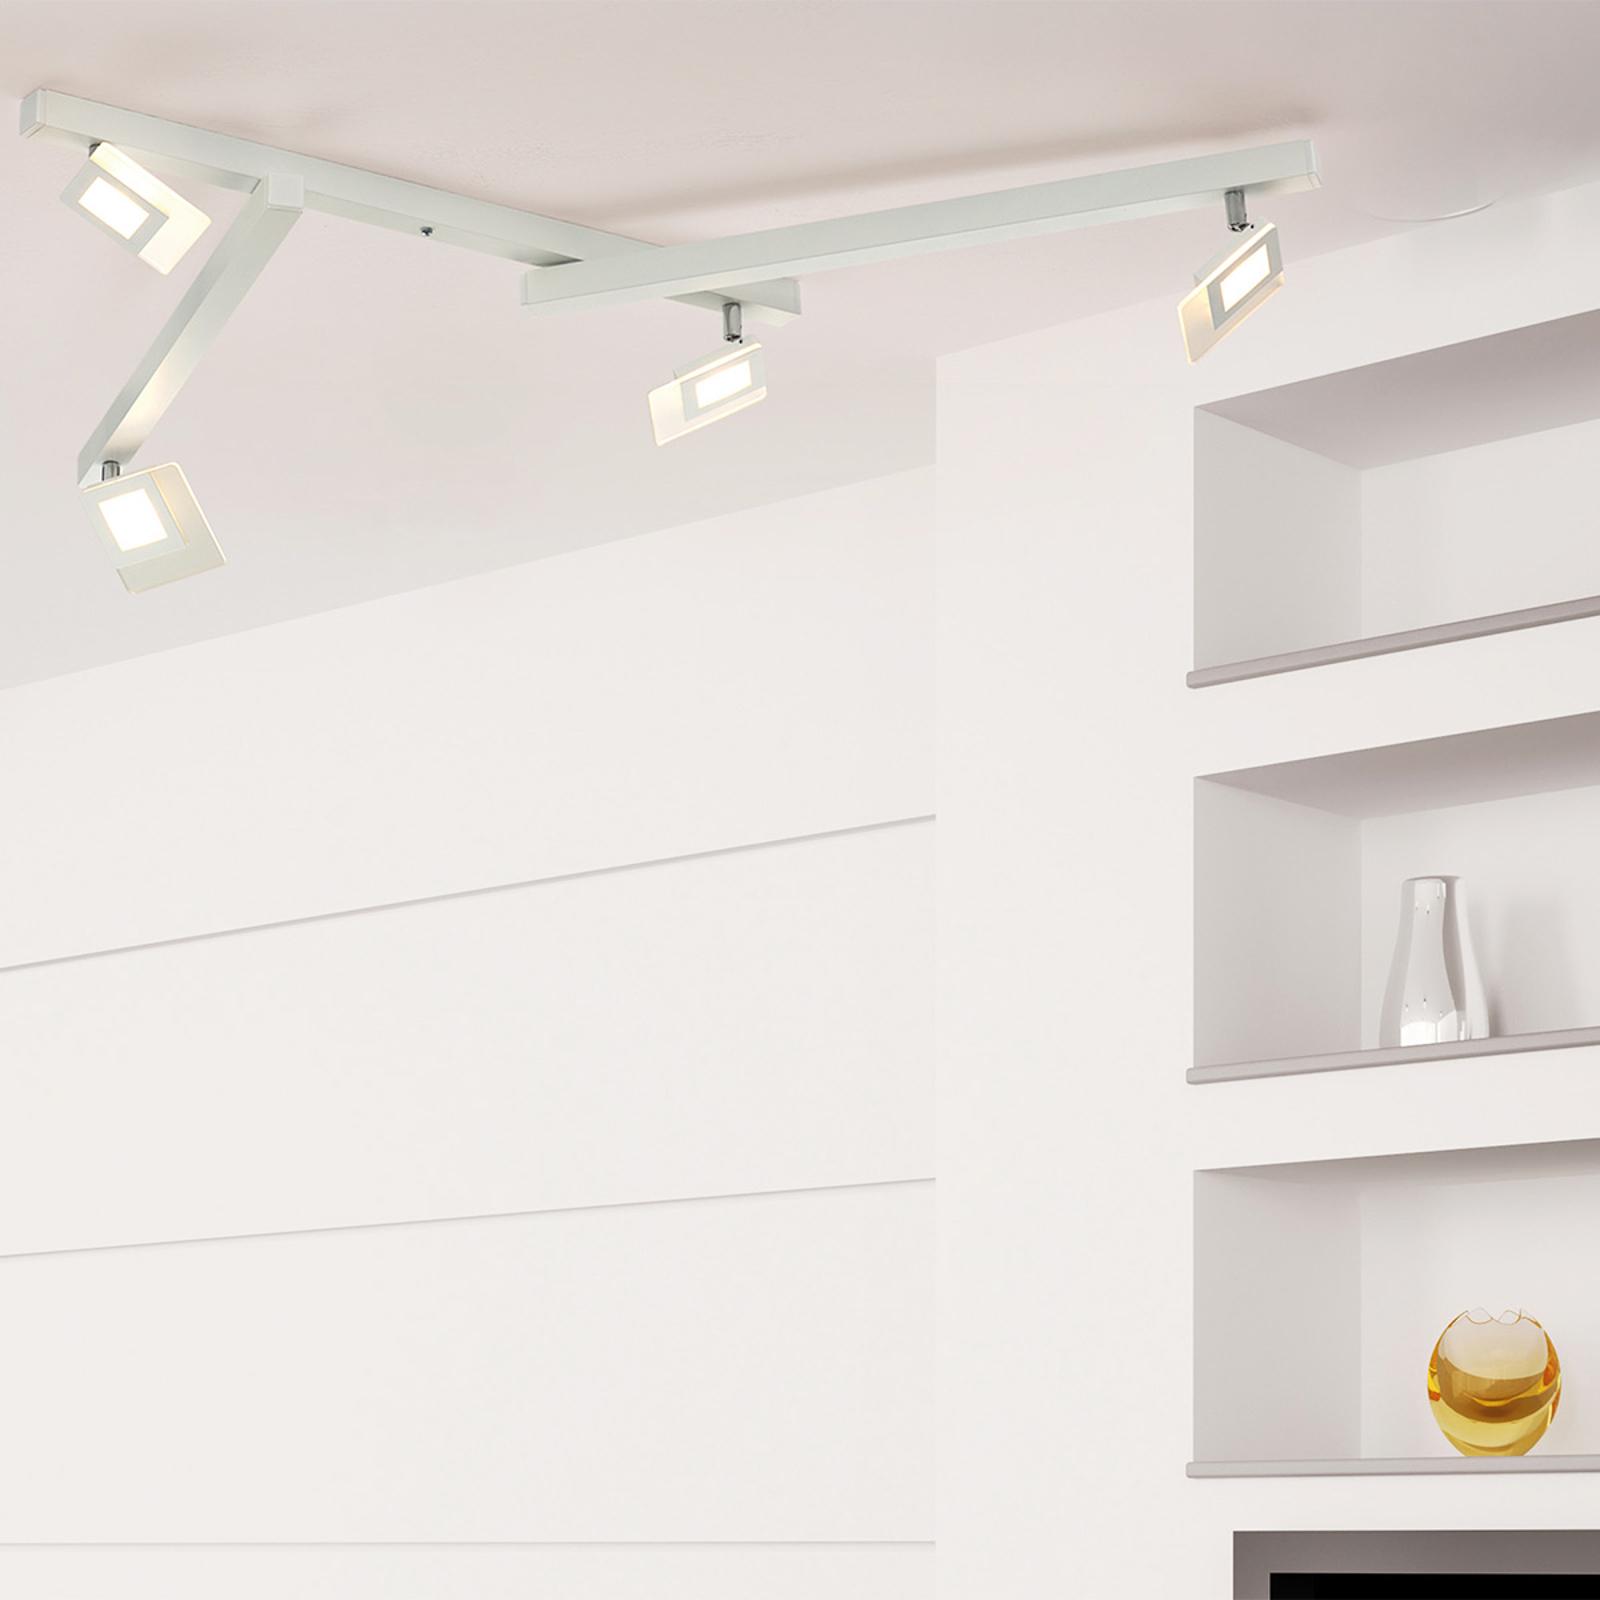 Bopp Line - fünfflammige LED-Deckenlampe in Weiß